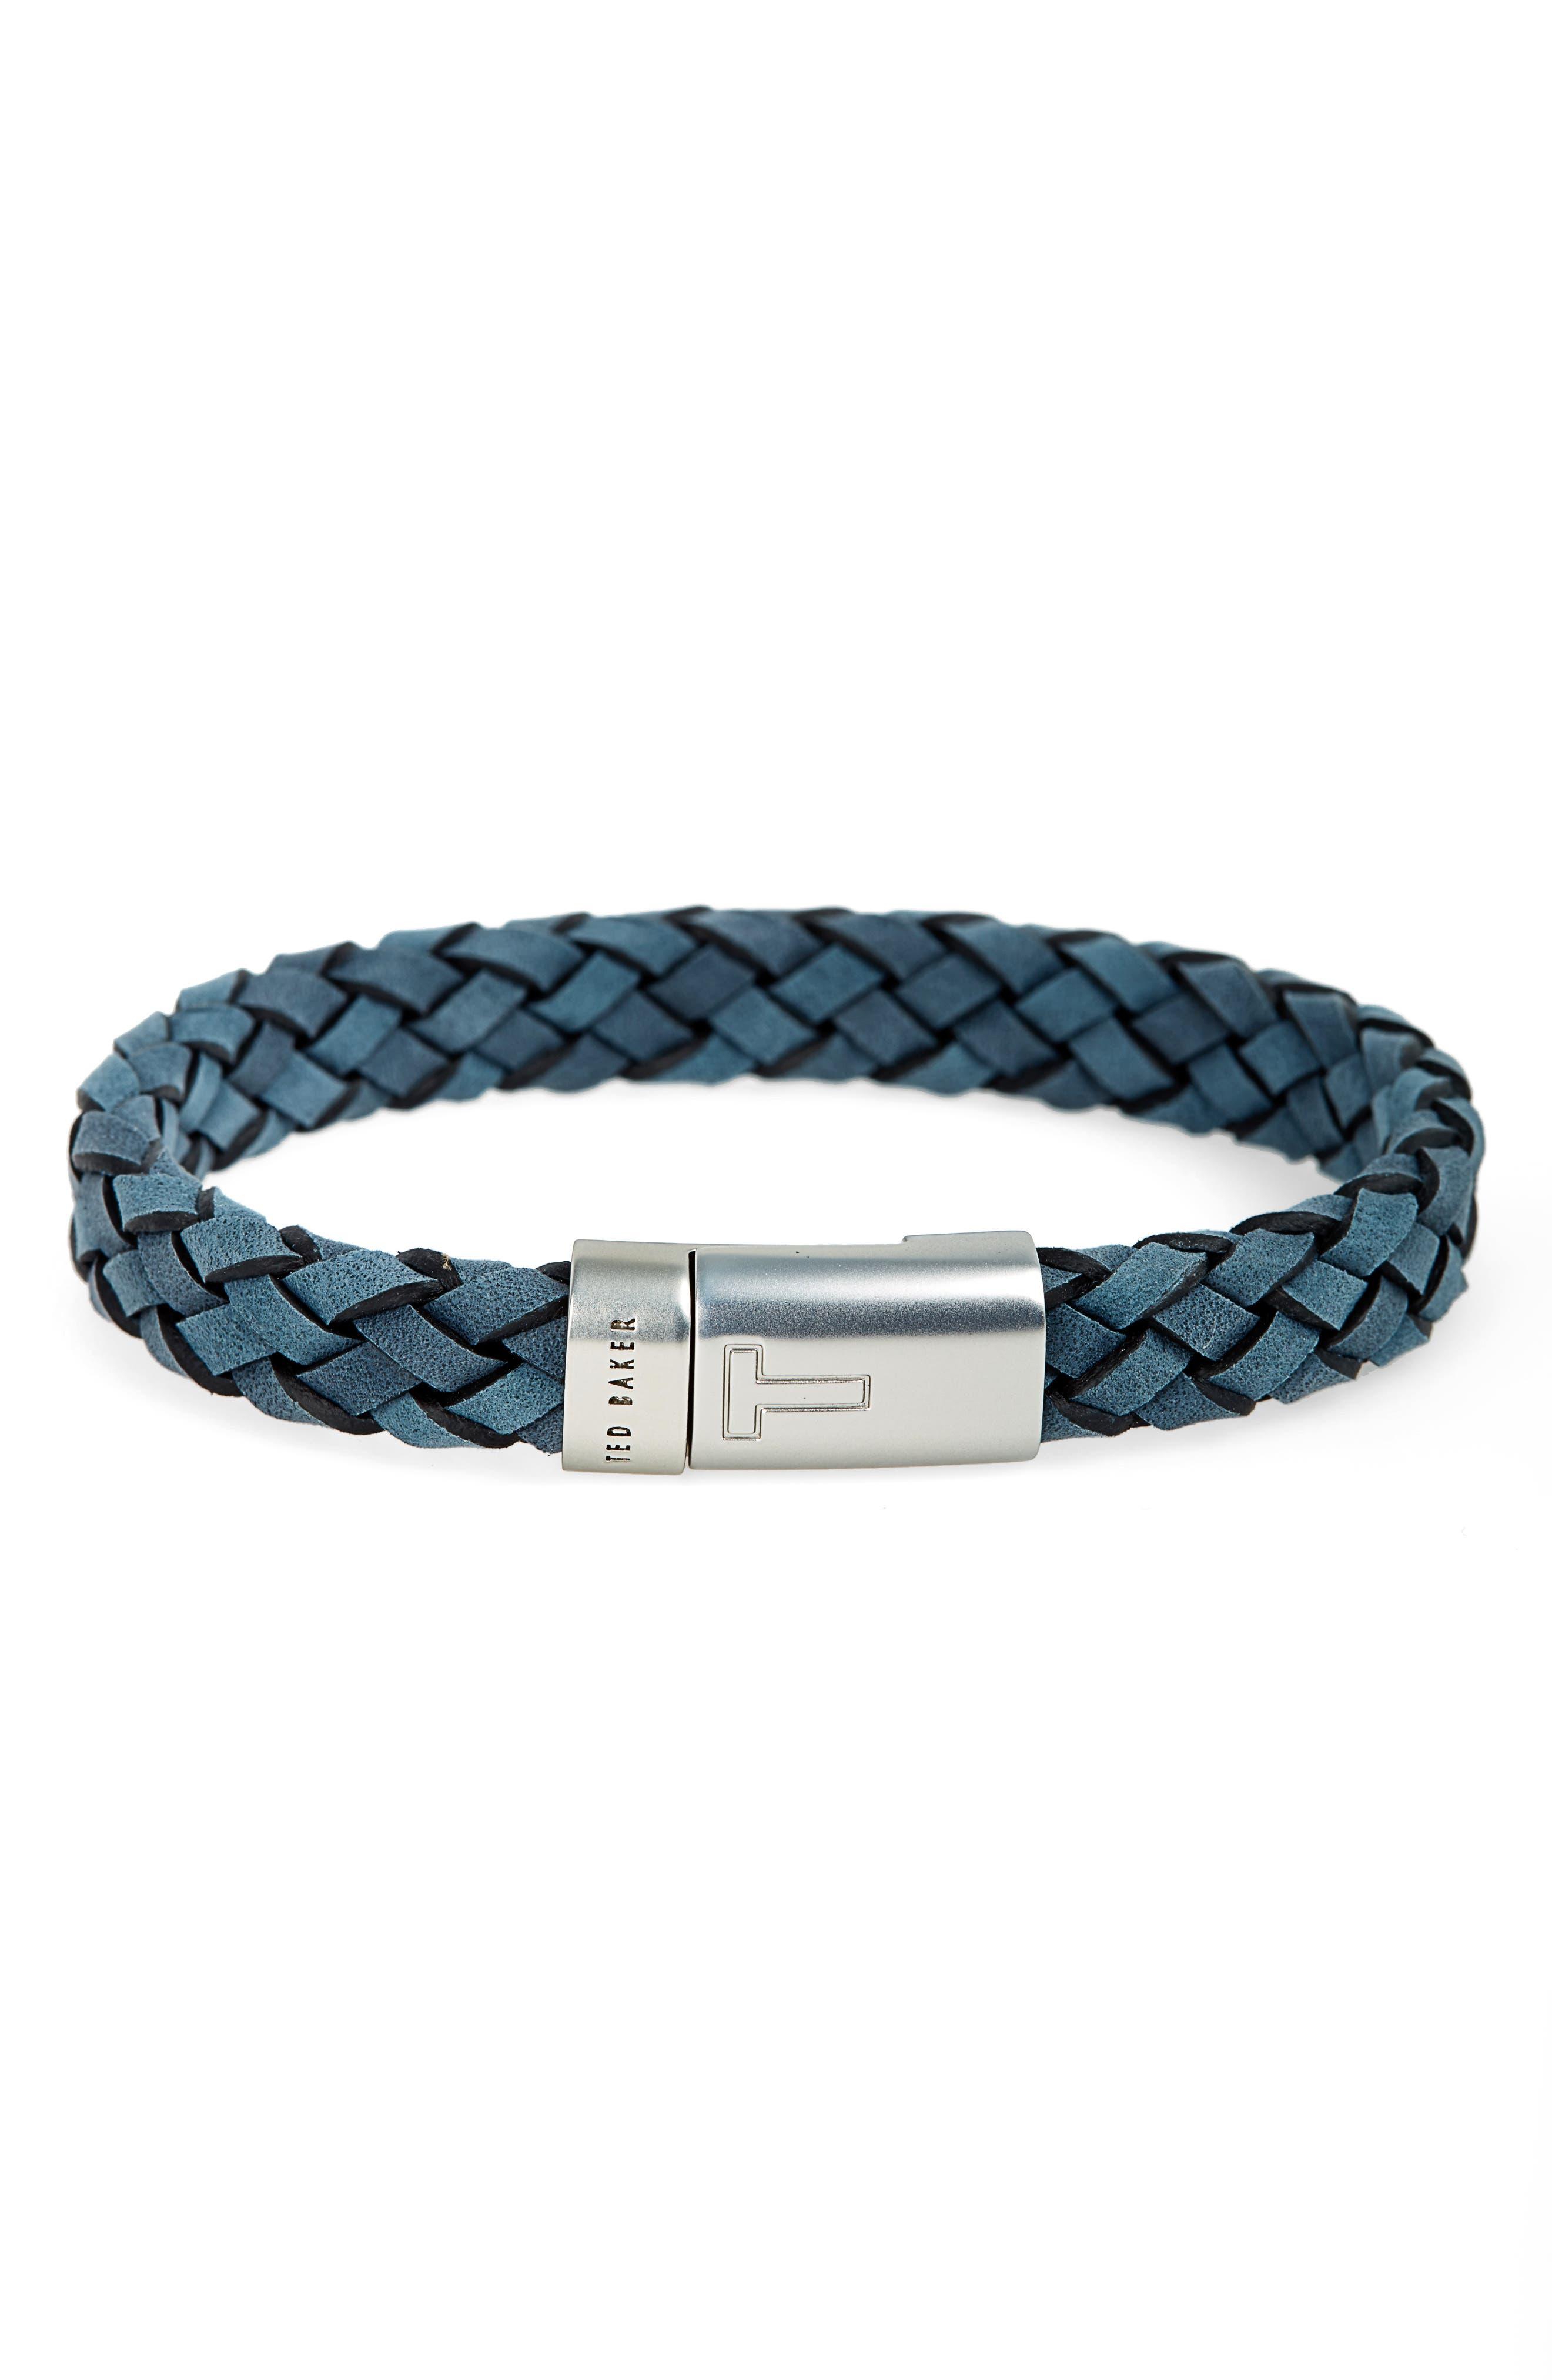 Runfast Woven Leather Bracelet,                         Main,                         color, Navy